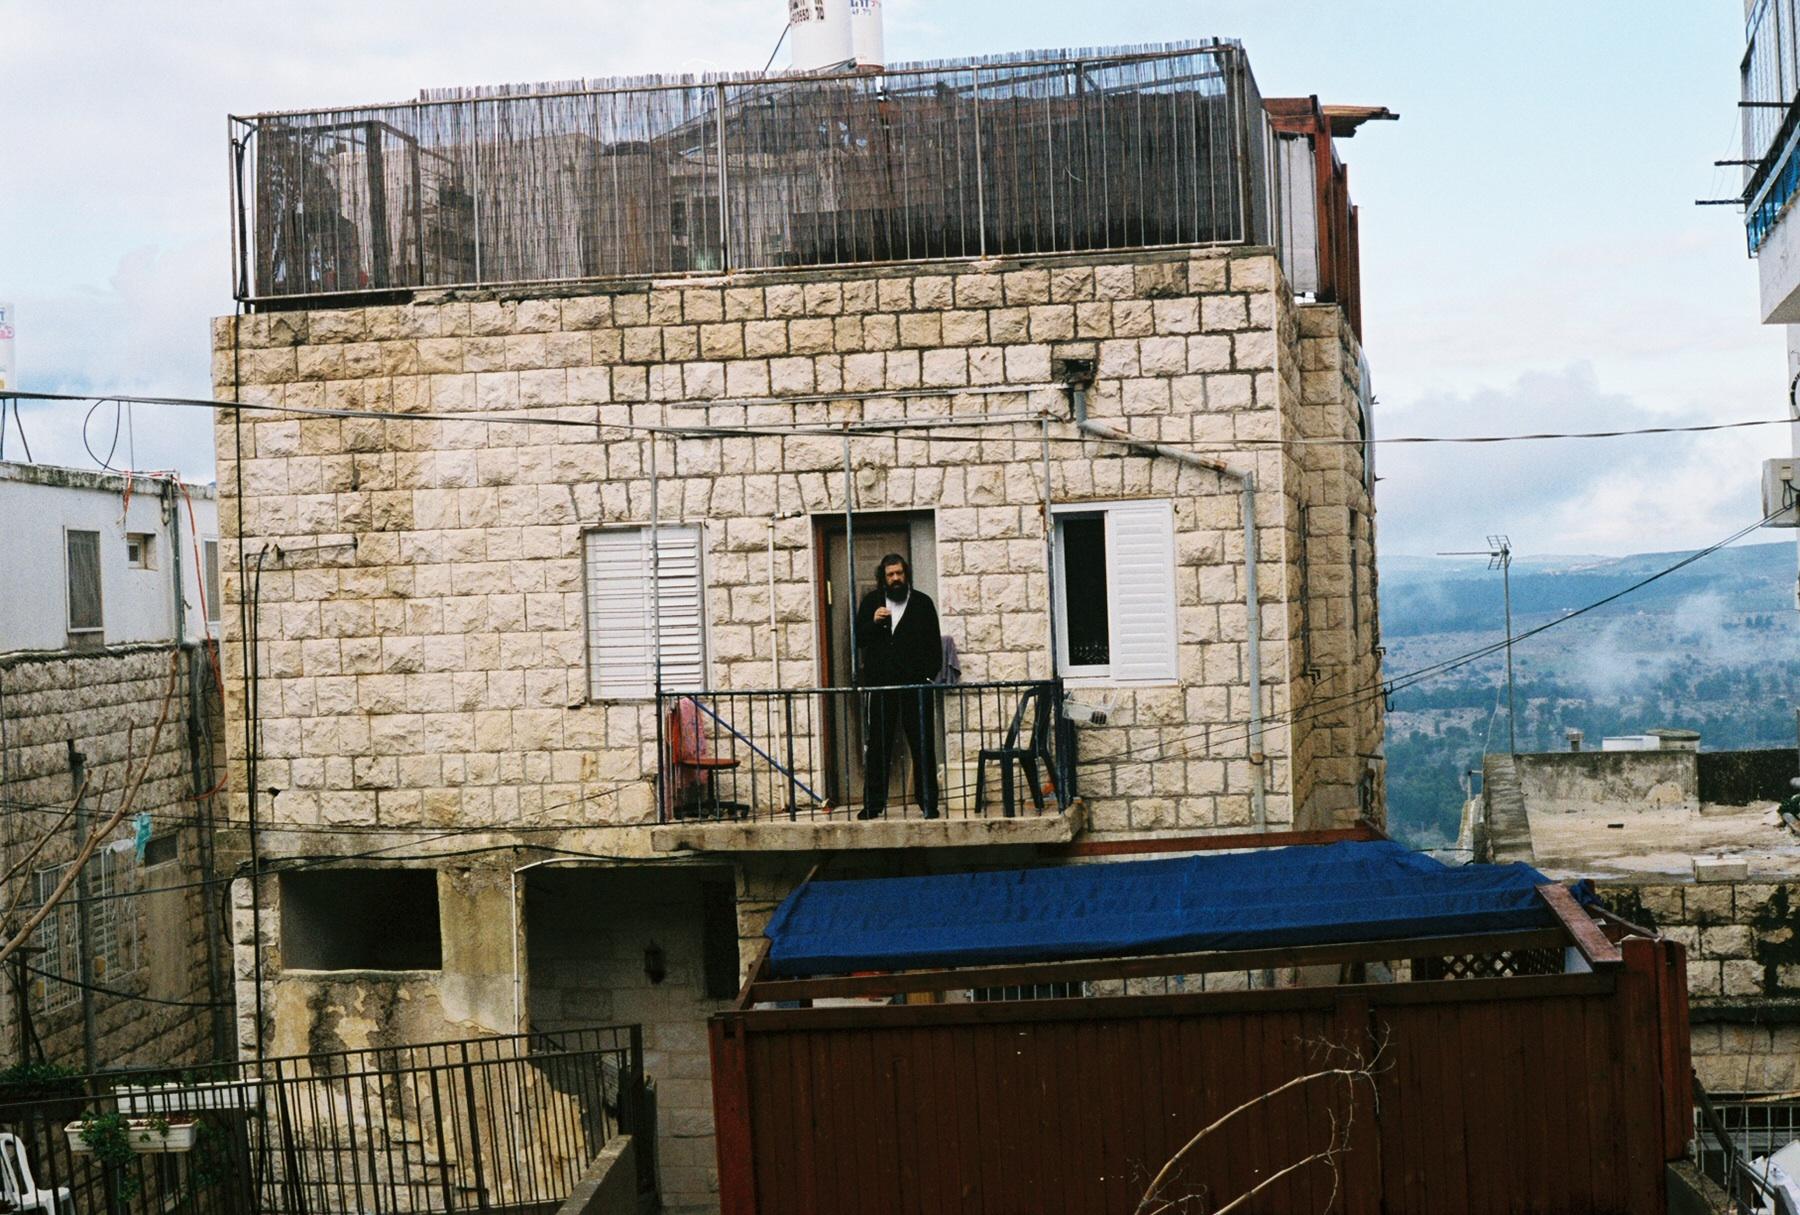 Zfat, Israel